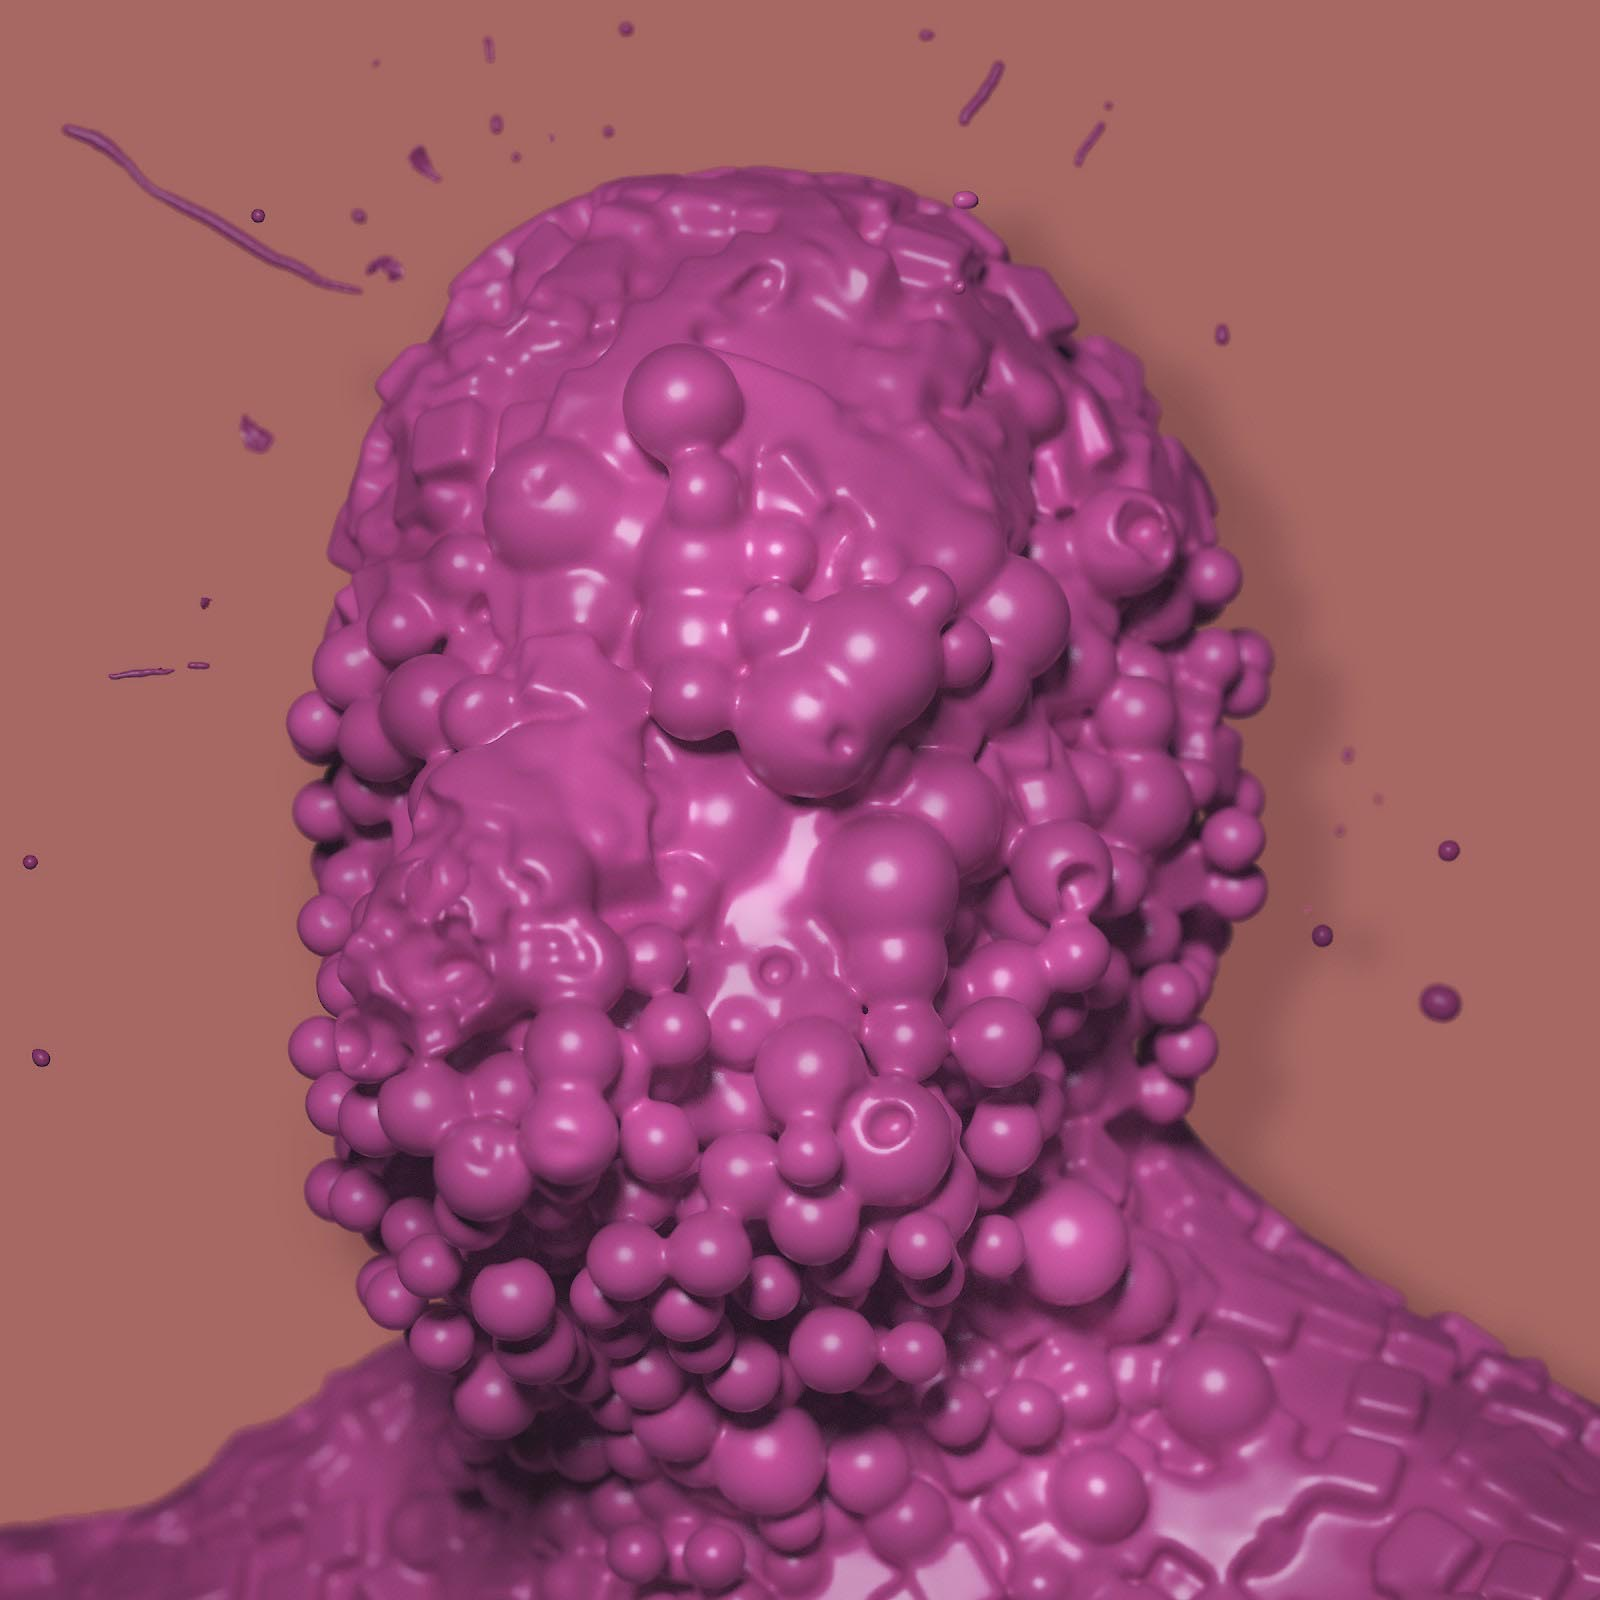 Botox Head Character Render Comic Blob Freeform Amorphous Bust Sculpture Displacement 3D man